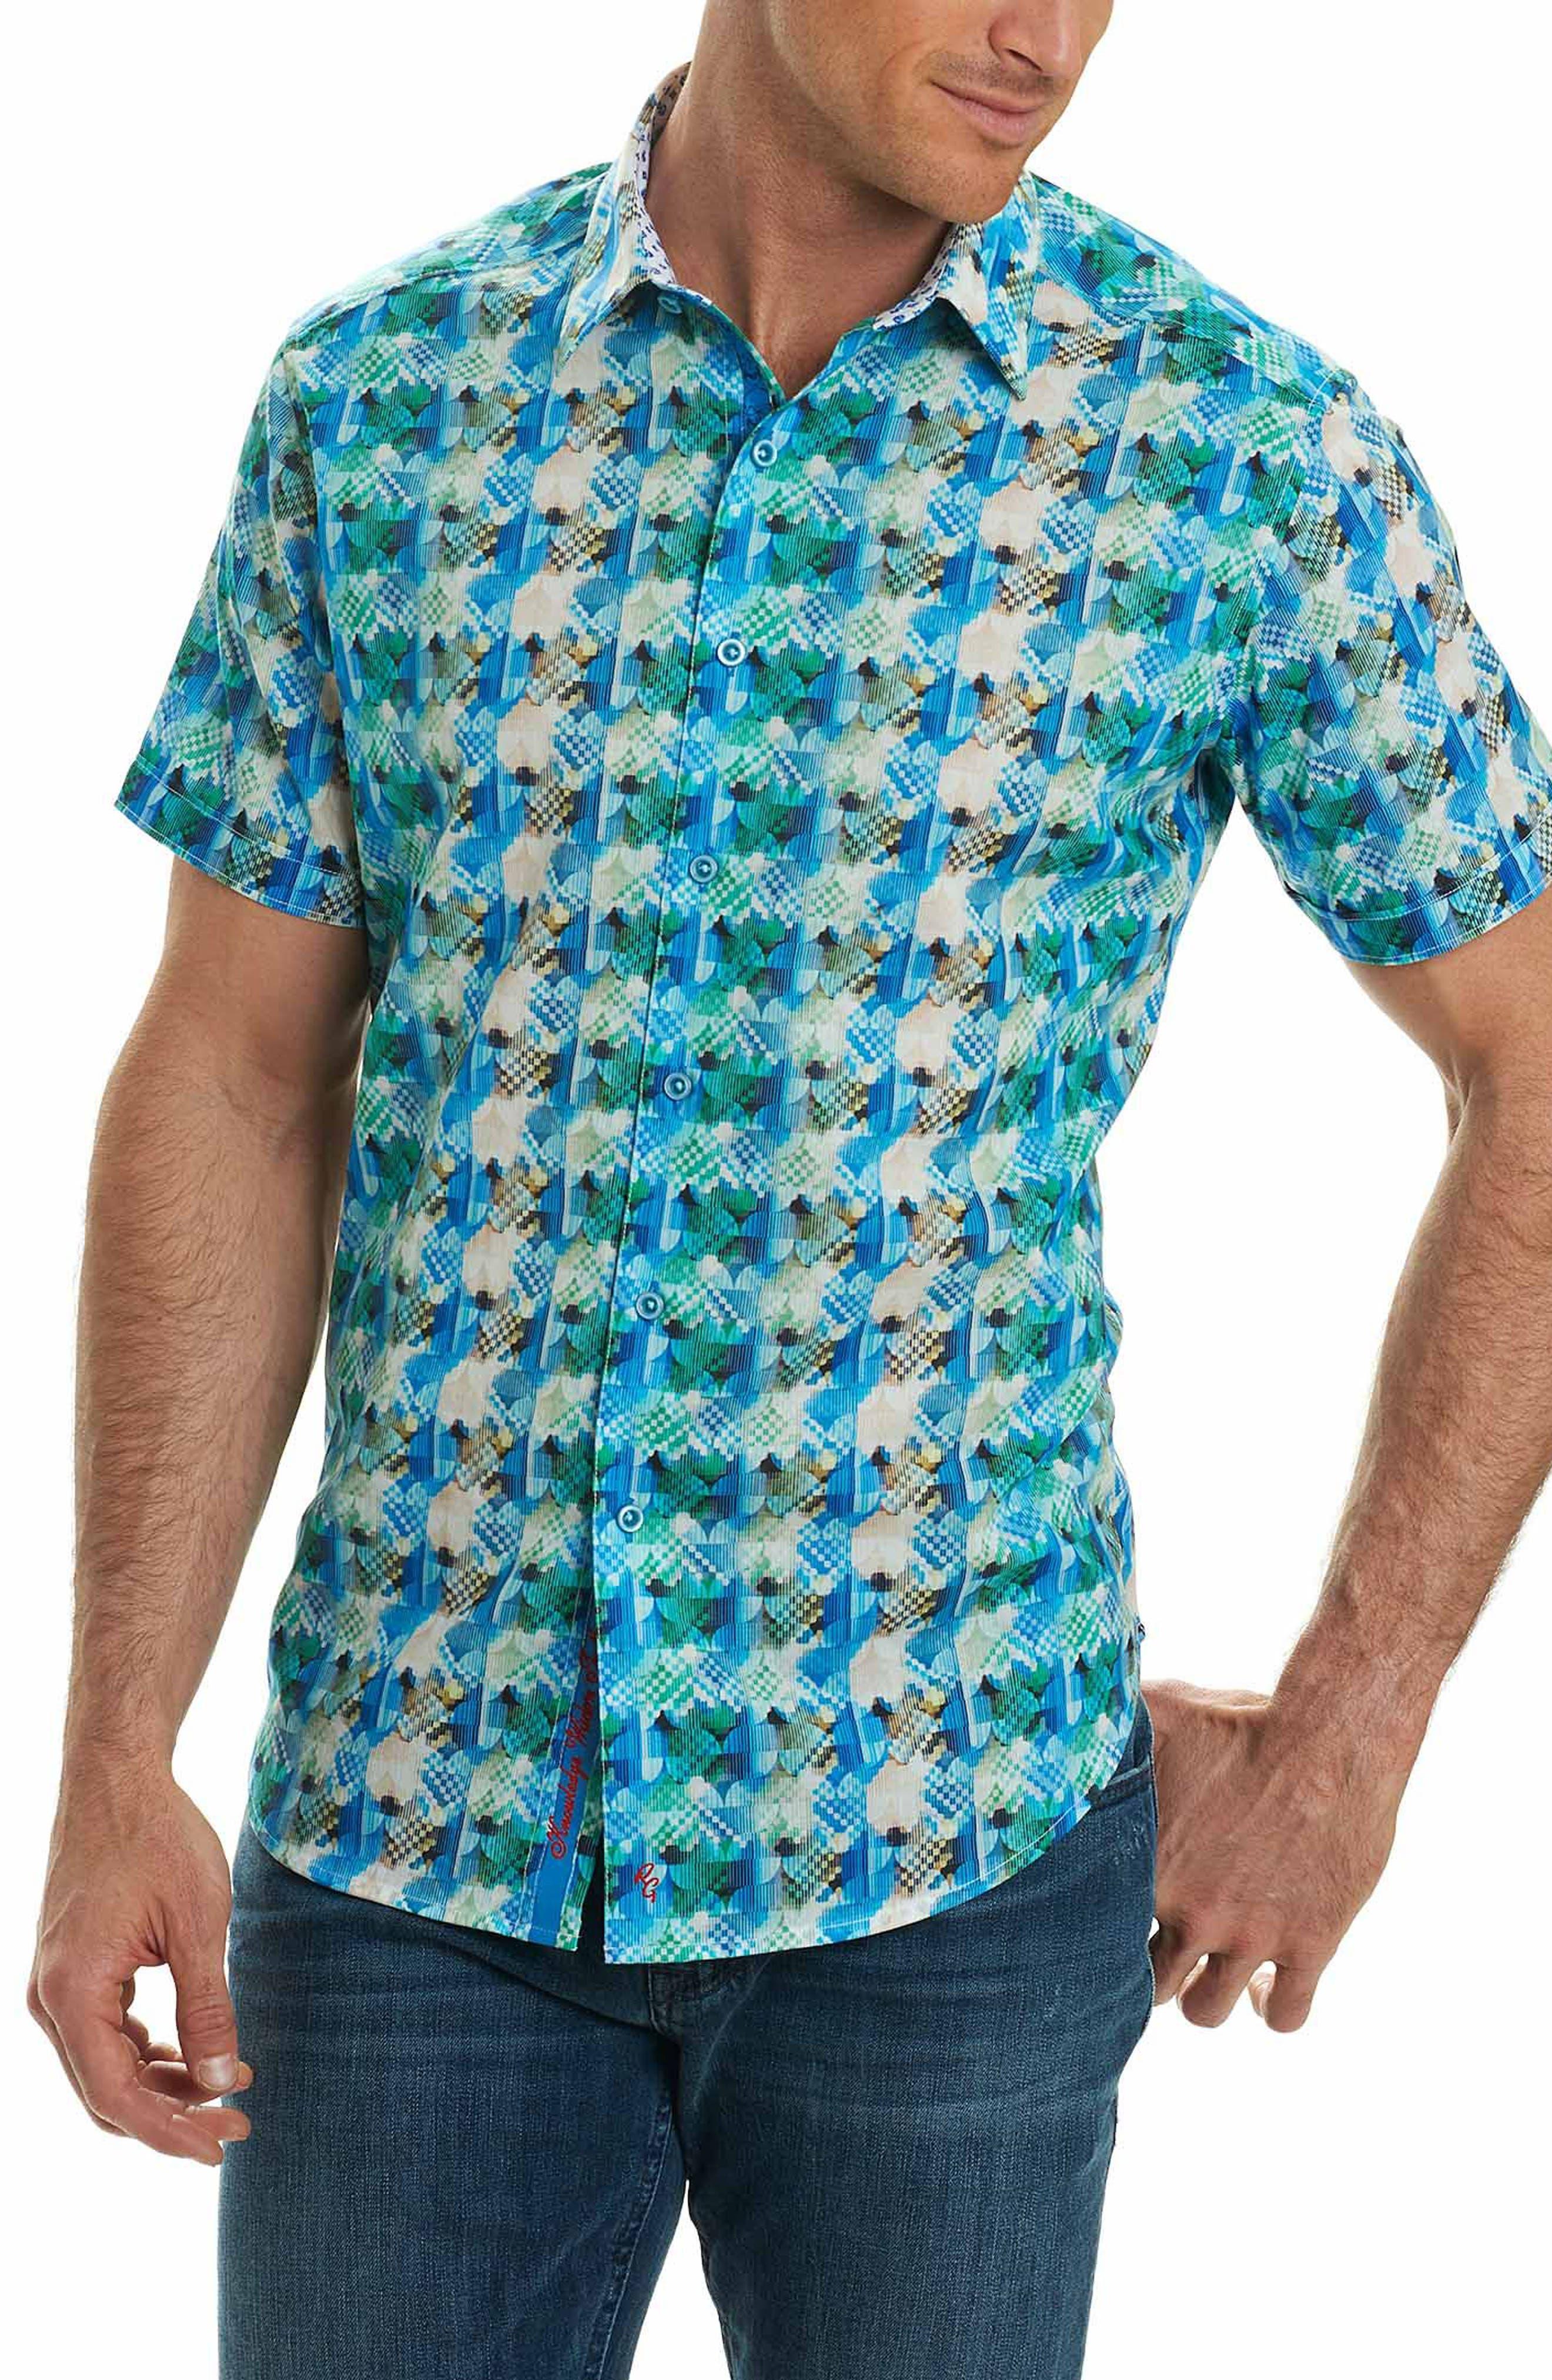 Illusions Sport Shirt,                             Main thumbnail 1, color,                             TURQUOISE